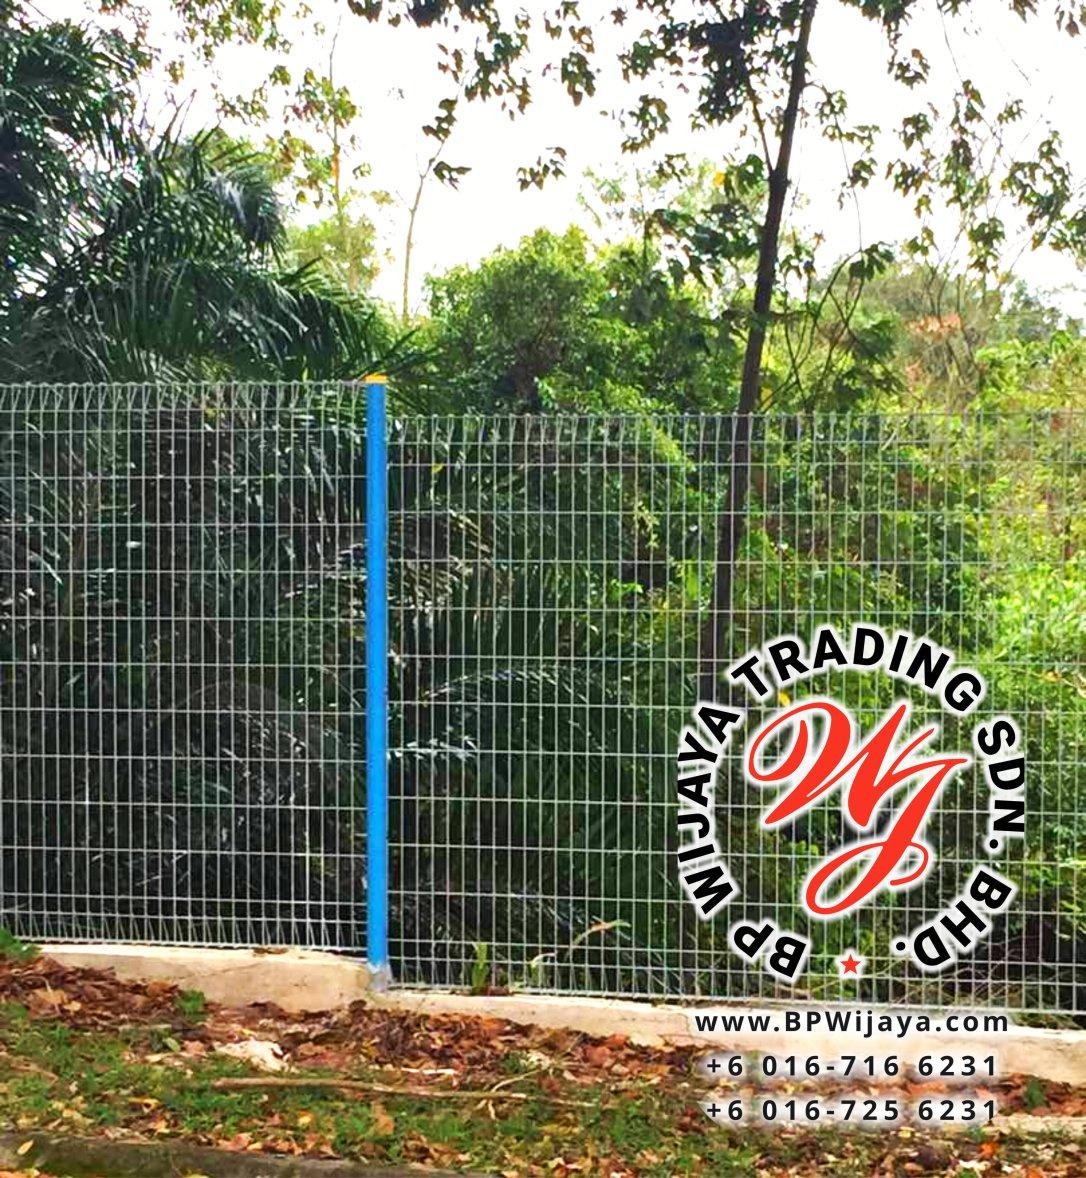 KUALA LUMPUR SELANGOR SECURITY FENCE SAFETY FENCE MANUFACTURER MALAYSIA BP WIJAYA BA04